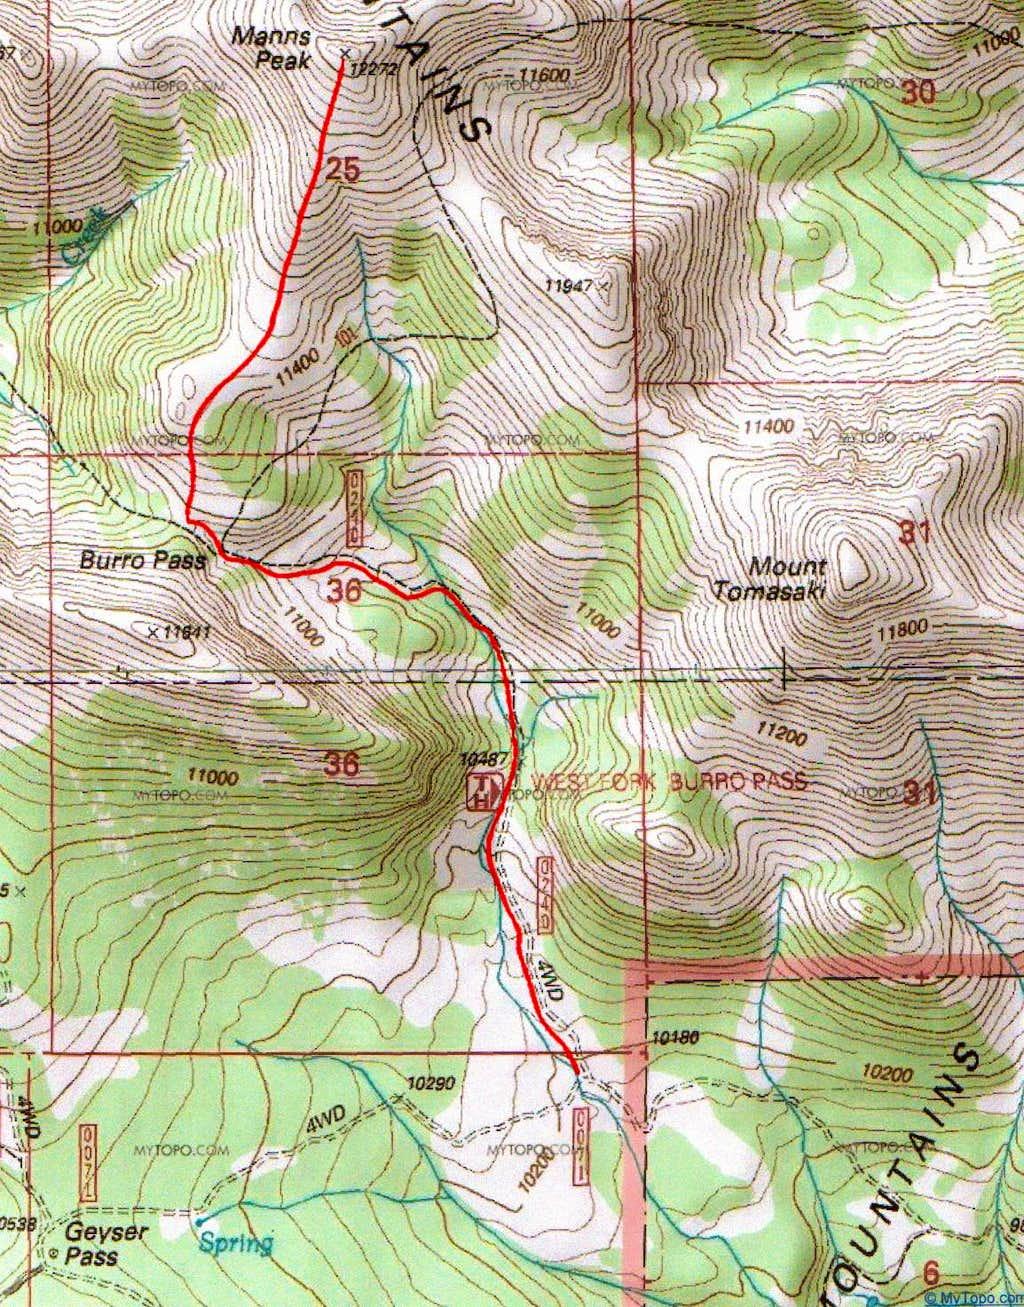 Manns Peak via Burro Pass East